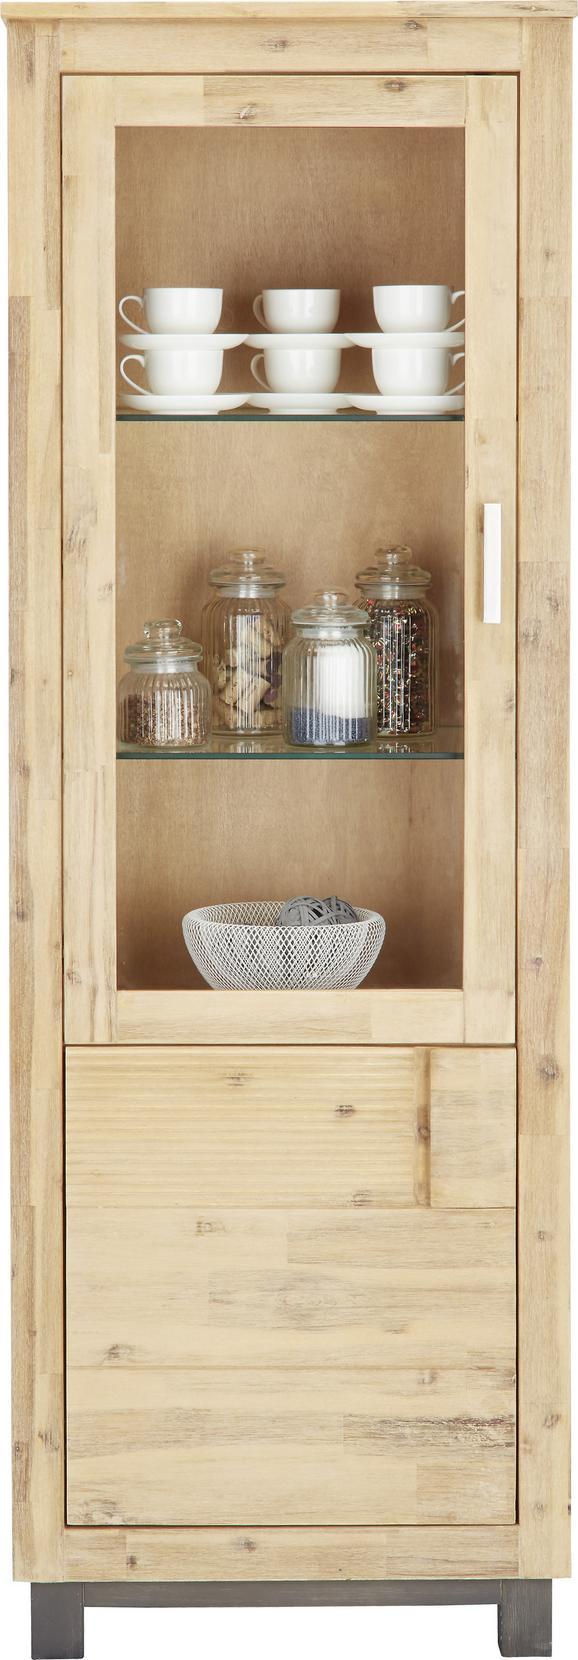 Vitrine Akaziefarben - Silberfarben/Akaziefarben, KONVENTIONELL, Glas/Holz (65/190/45cm) - Zandiara